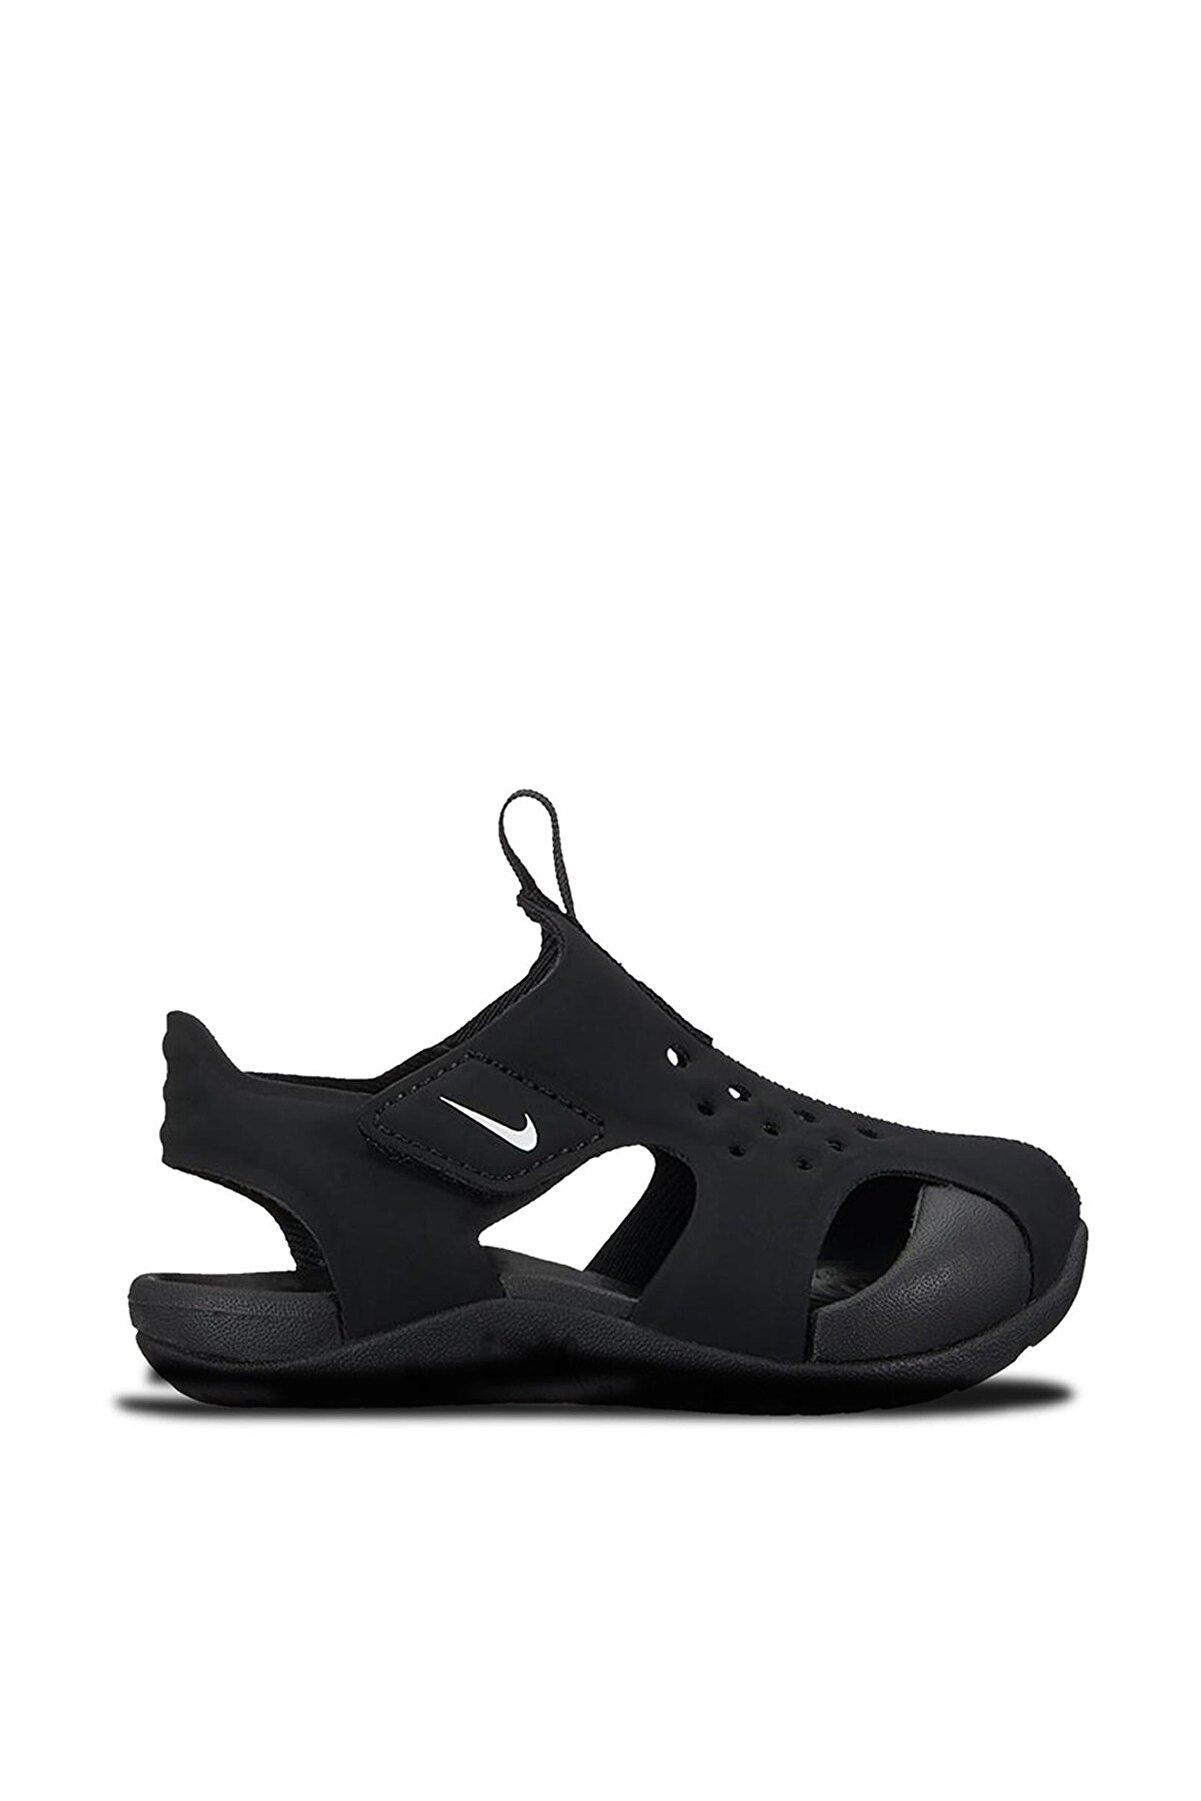 Nike Siyah 943827-001 Sunray Protect 2 Havuz Deniz Bebek Sandalet